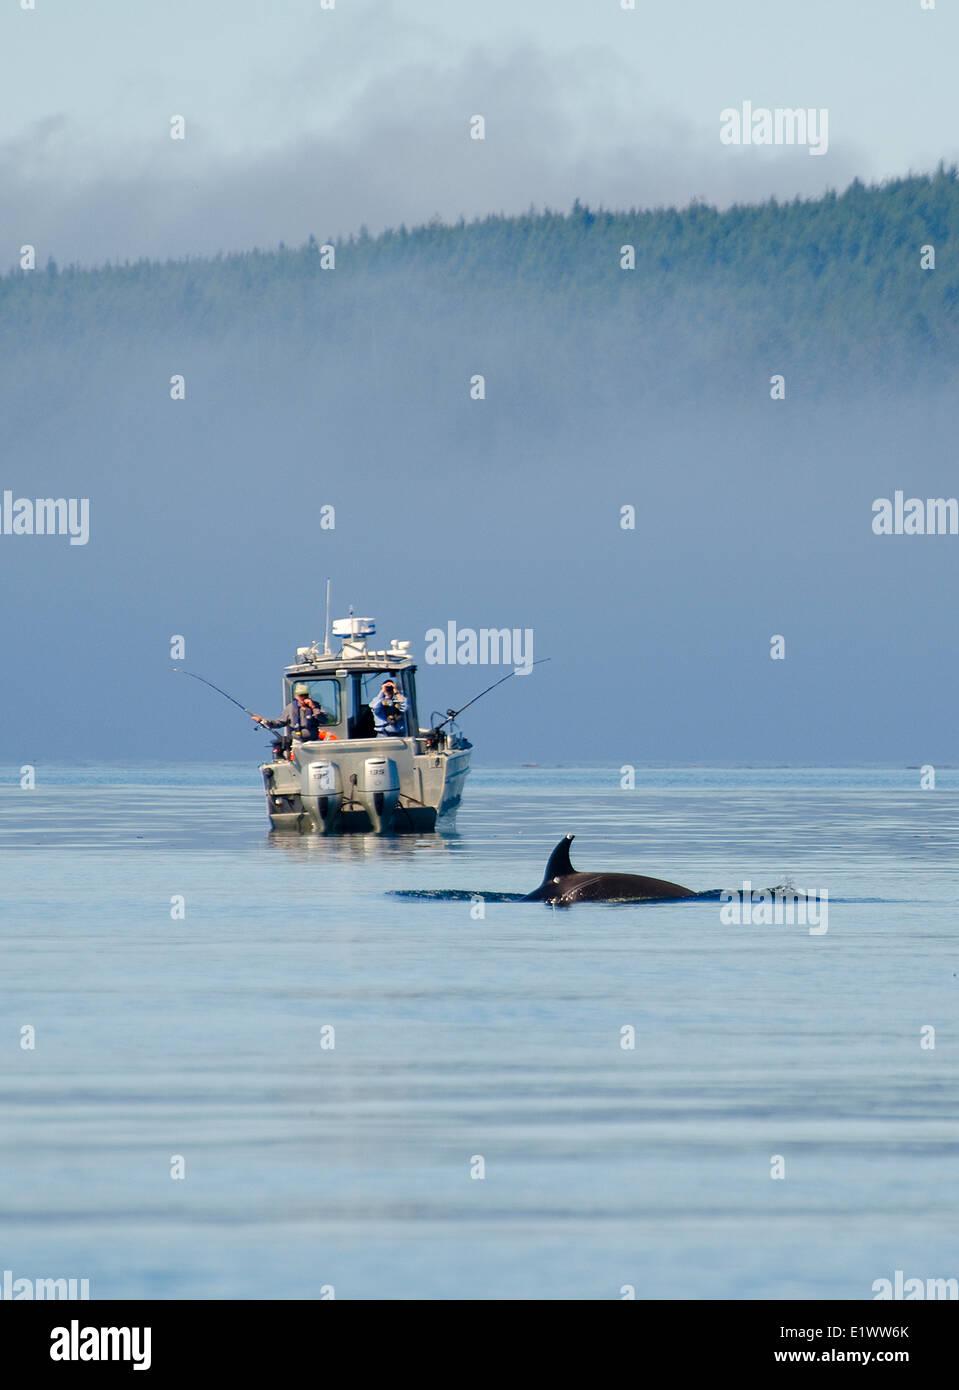 Orca sighting, Johnstone Strait, Vancouver Island, British Columbia, Canada. - Stock Image